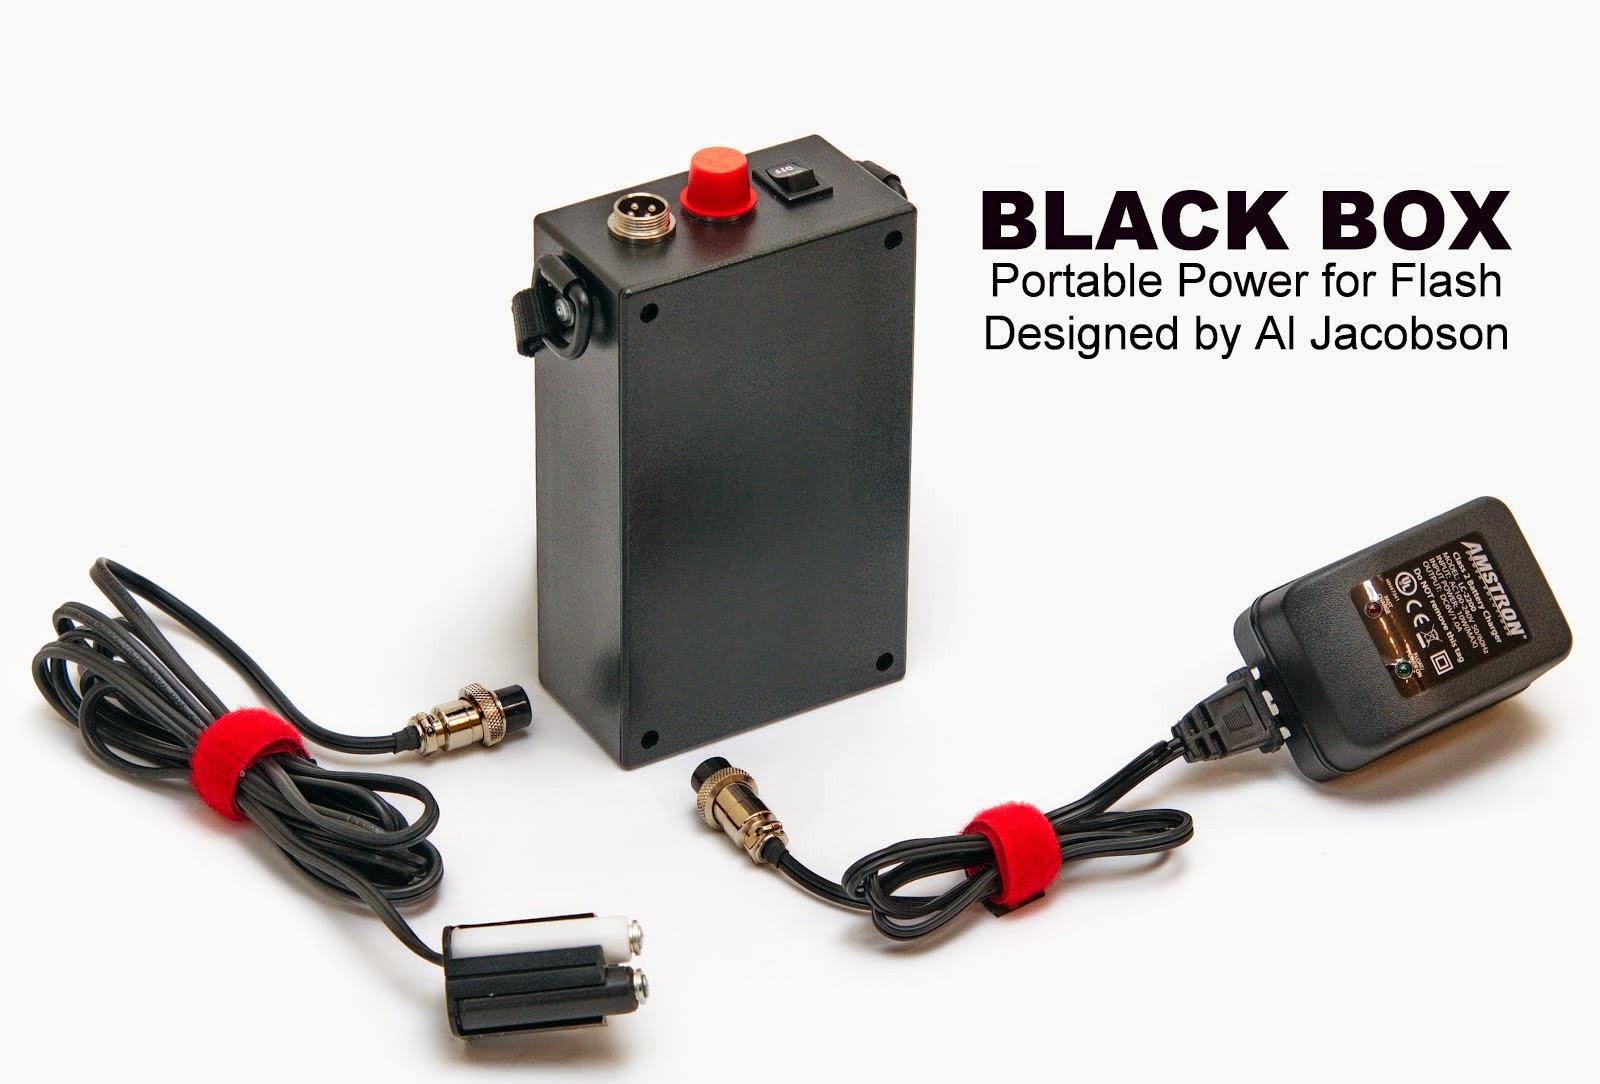 BLACK BOX PORTABLE POWER